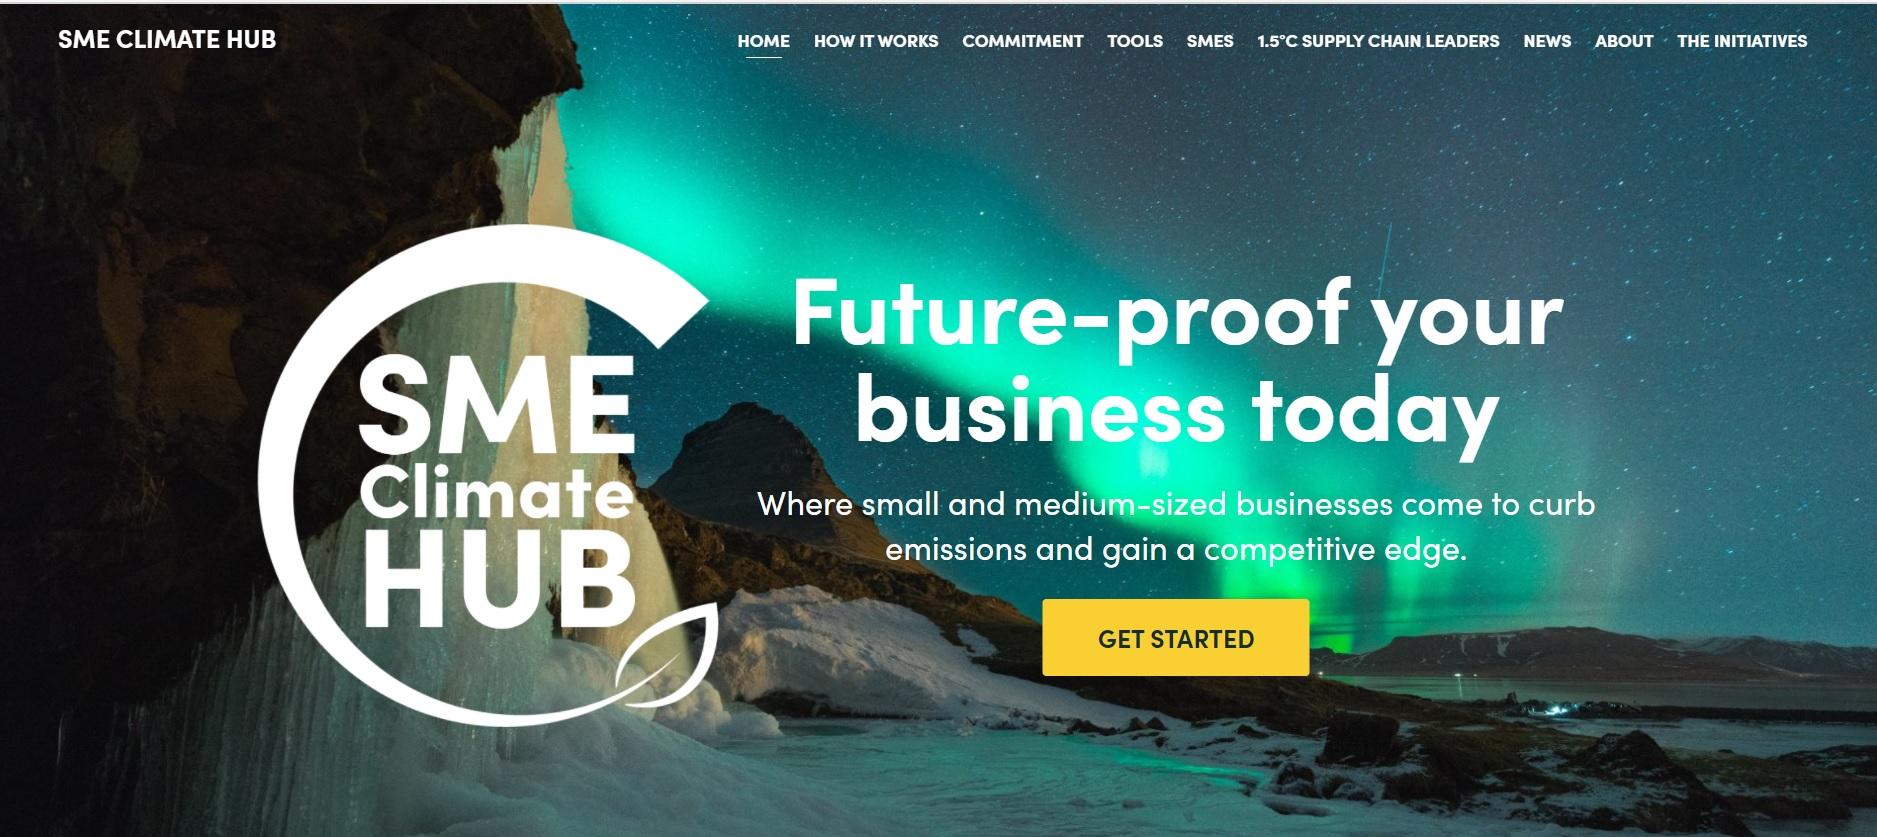 SME Climate Hub website home page